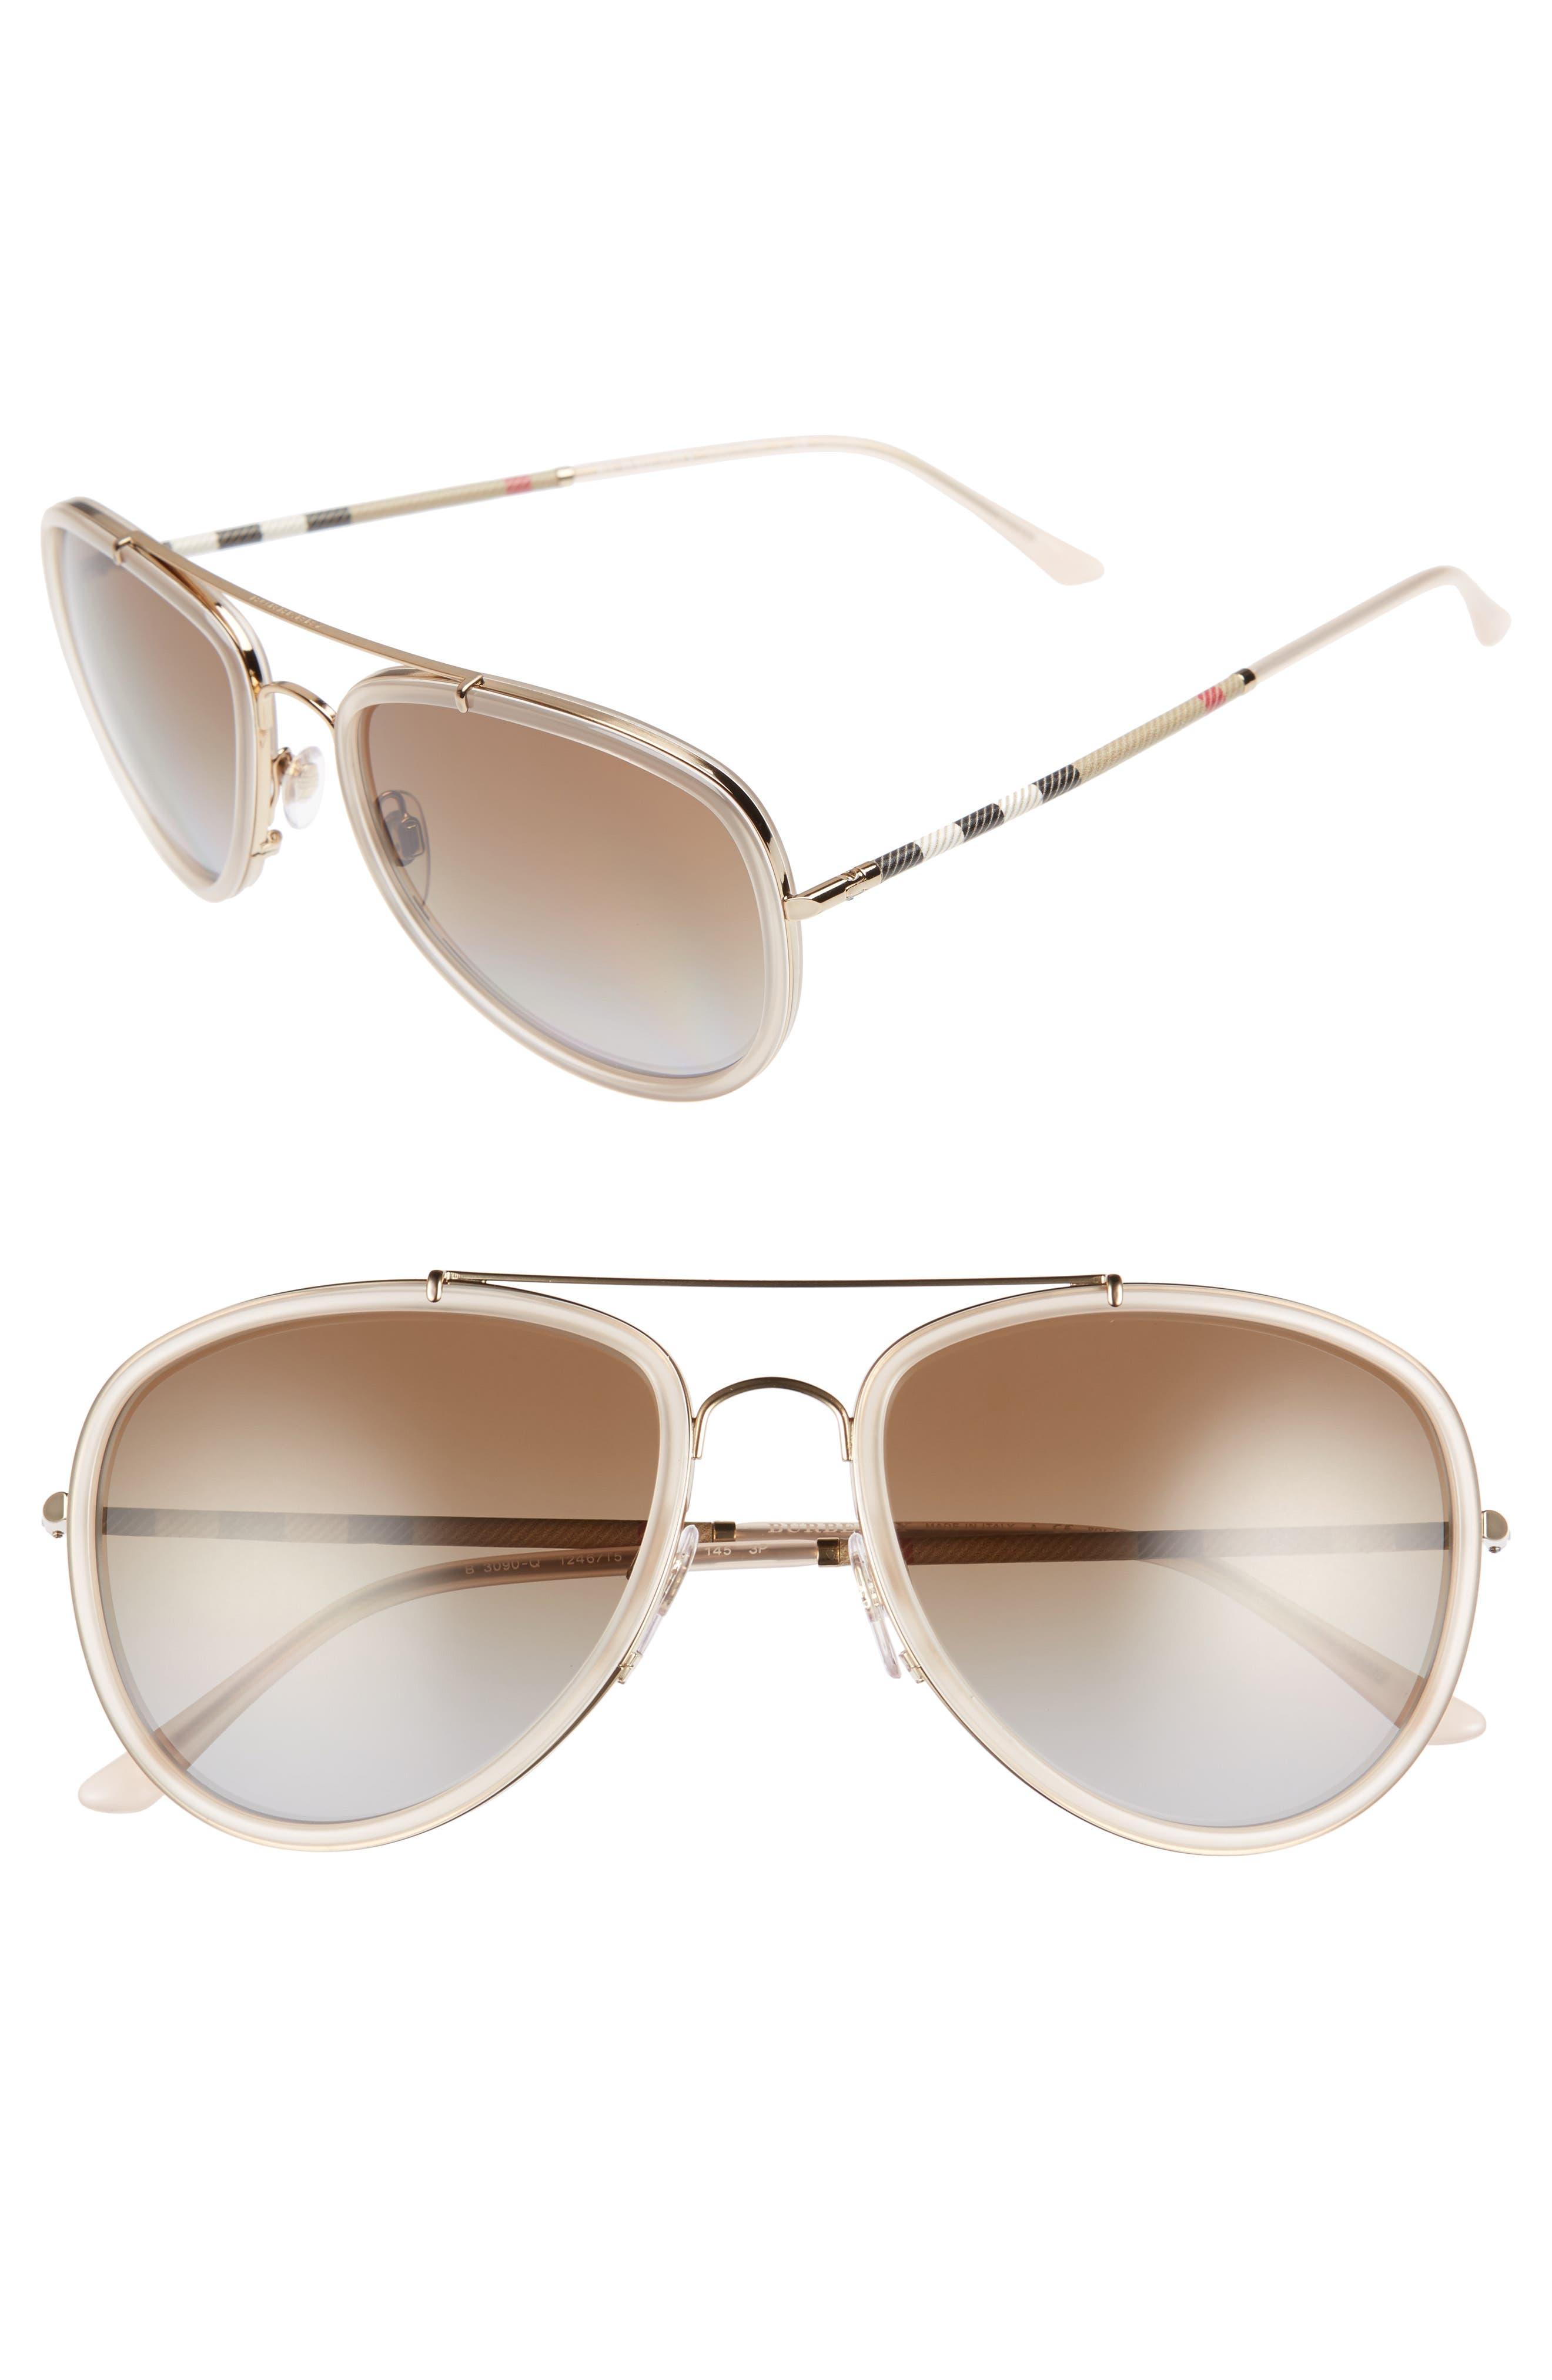 Main Image - Burberry 58mm Check Temple Pilot Sunglasses